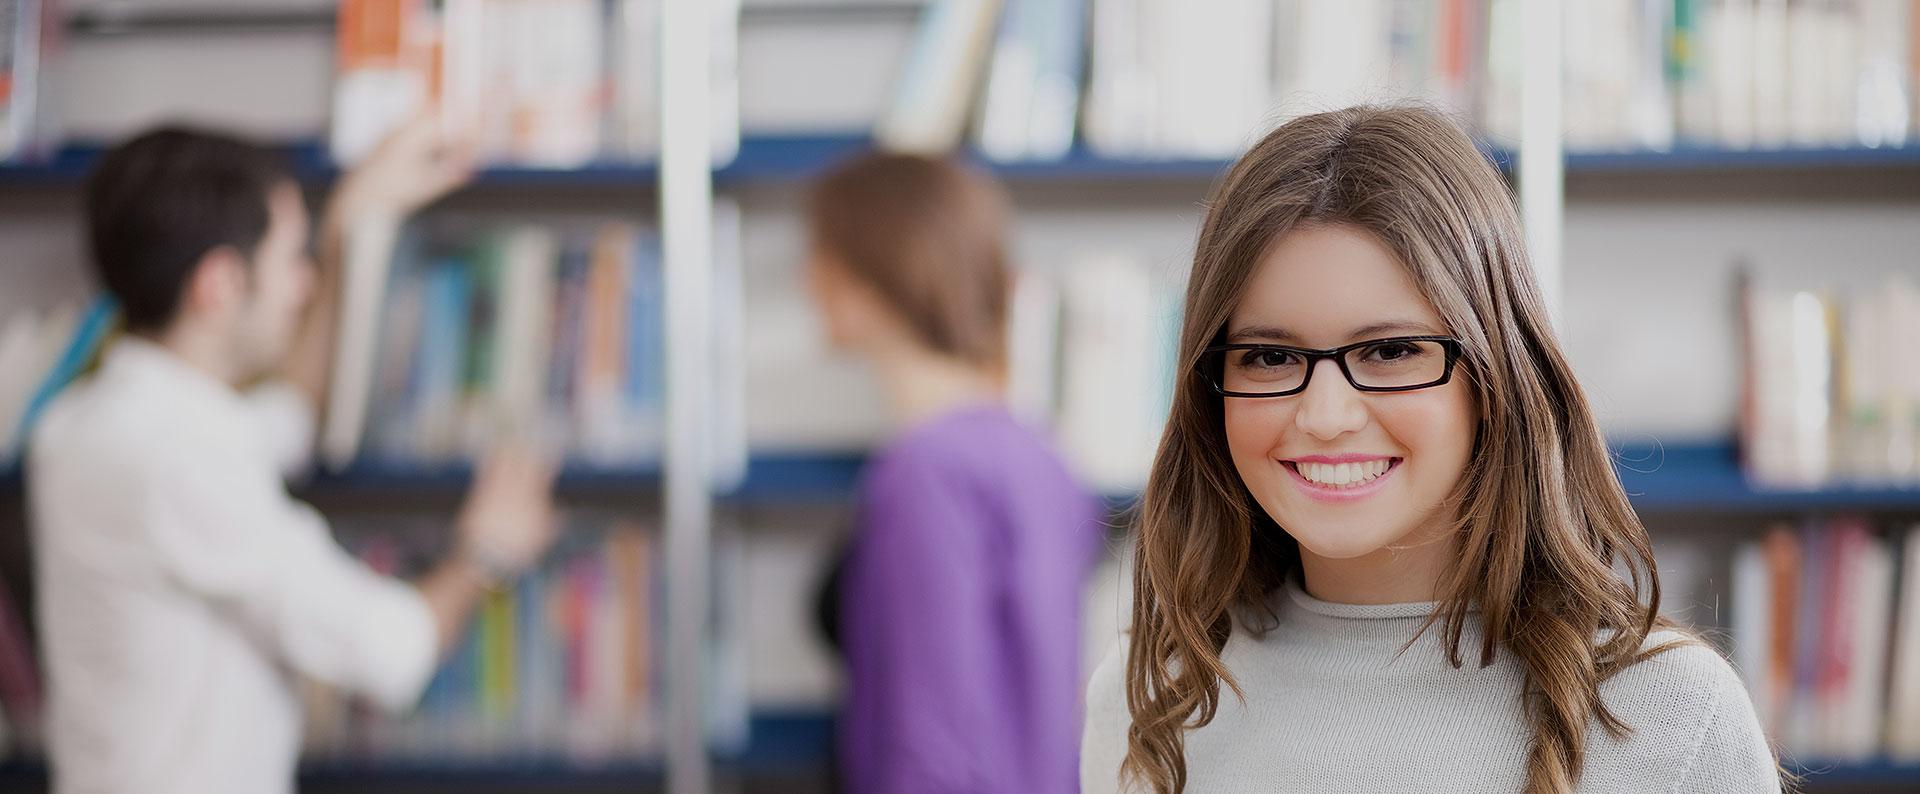 studente in libreria